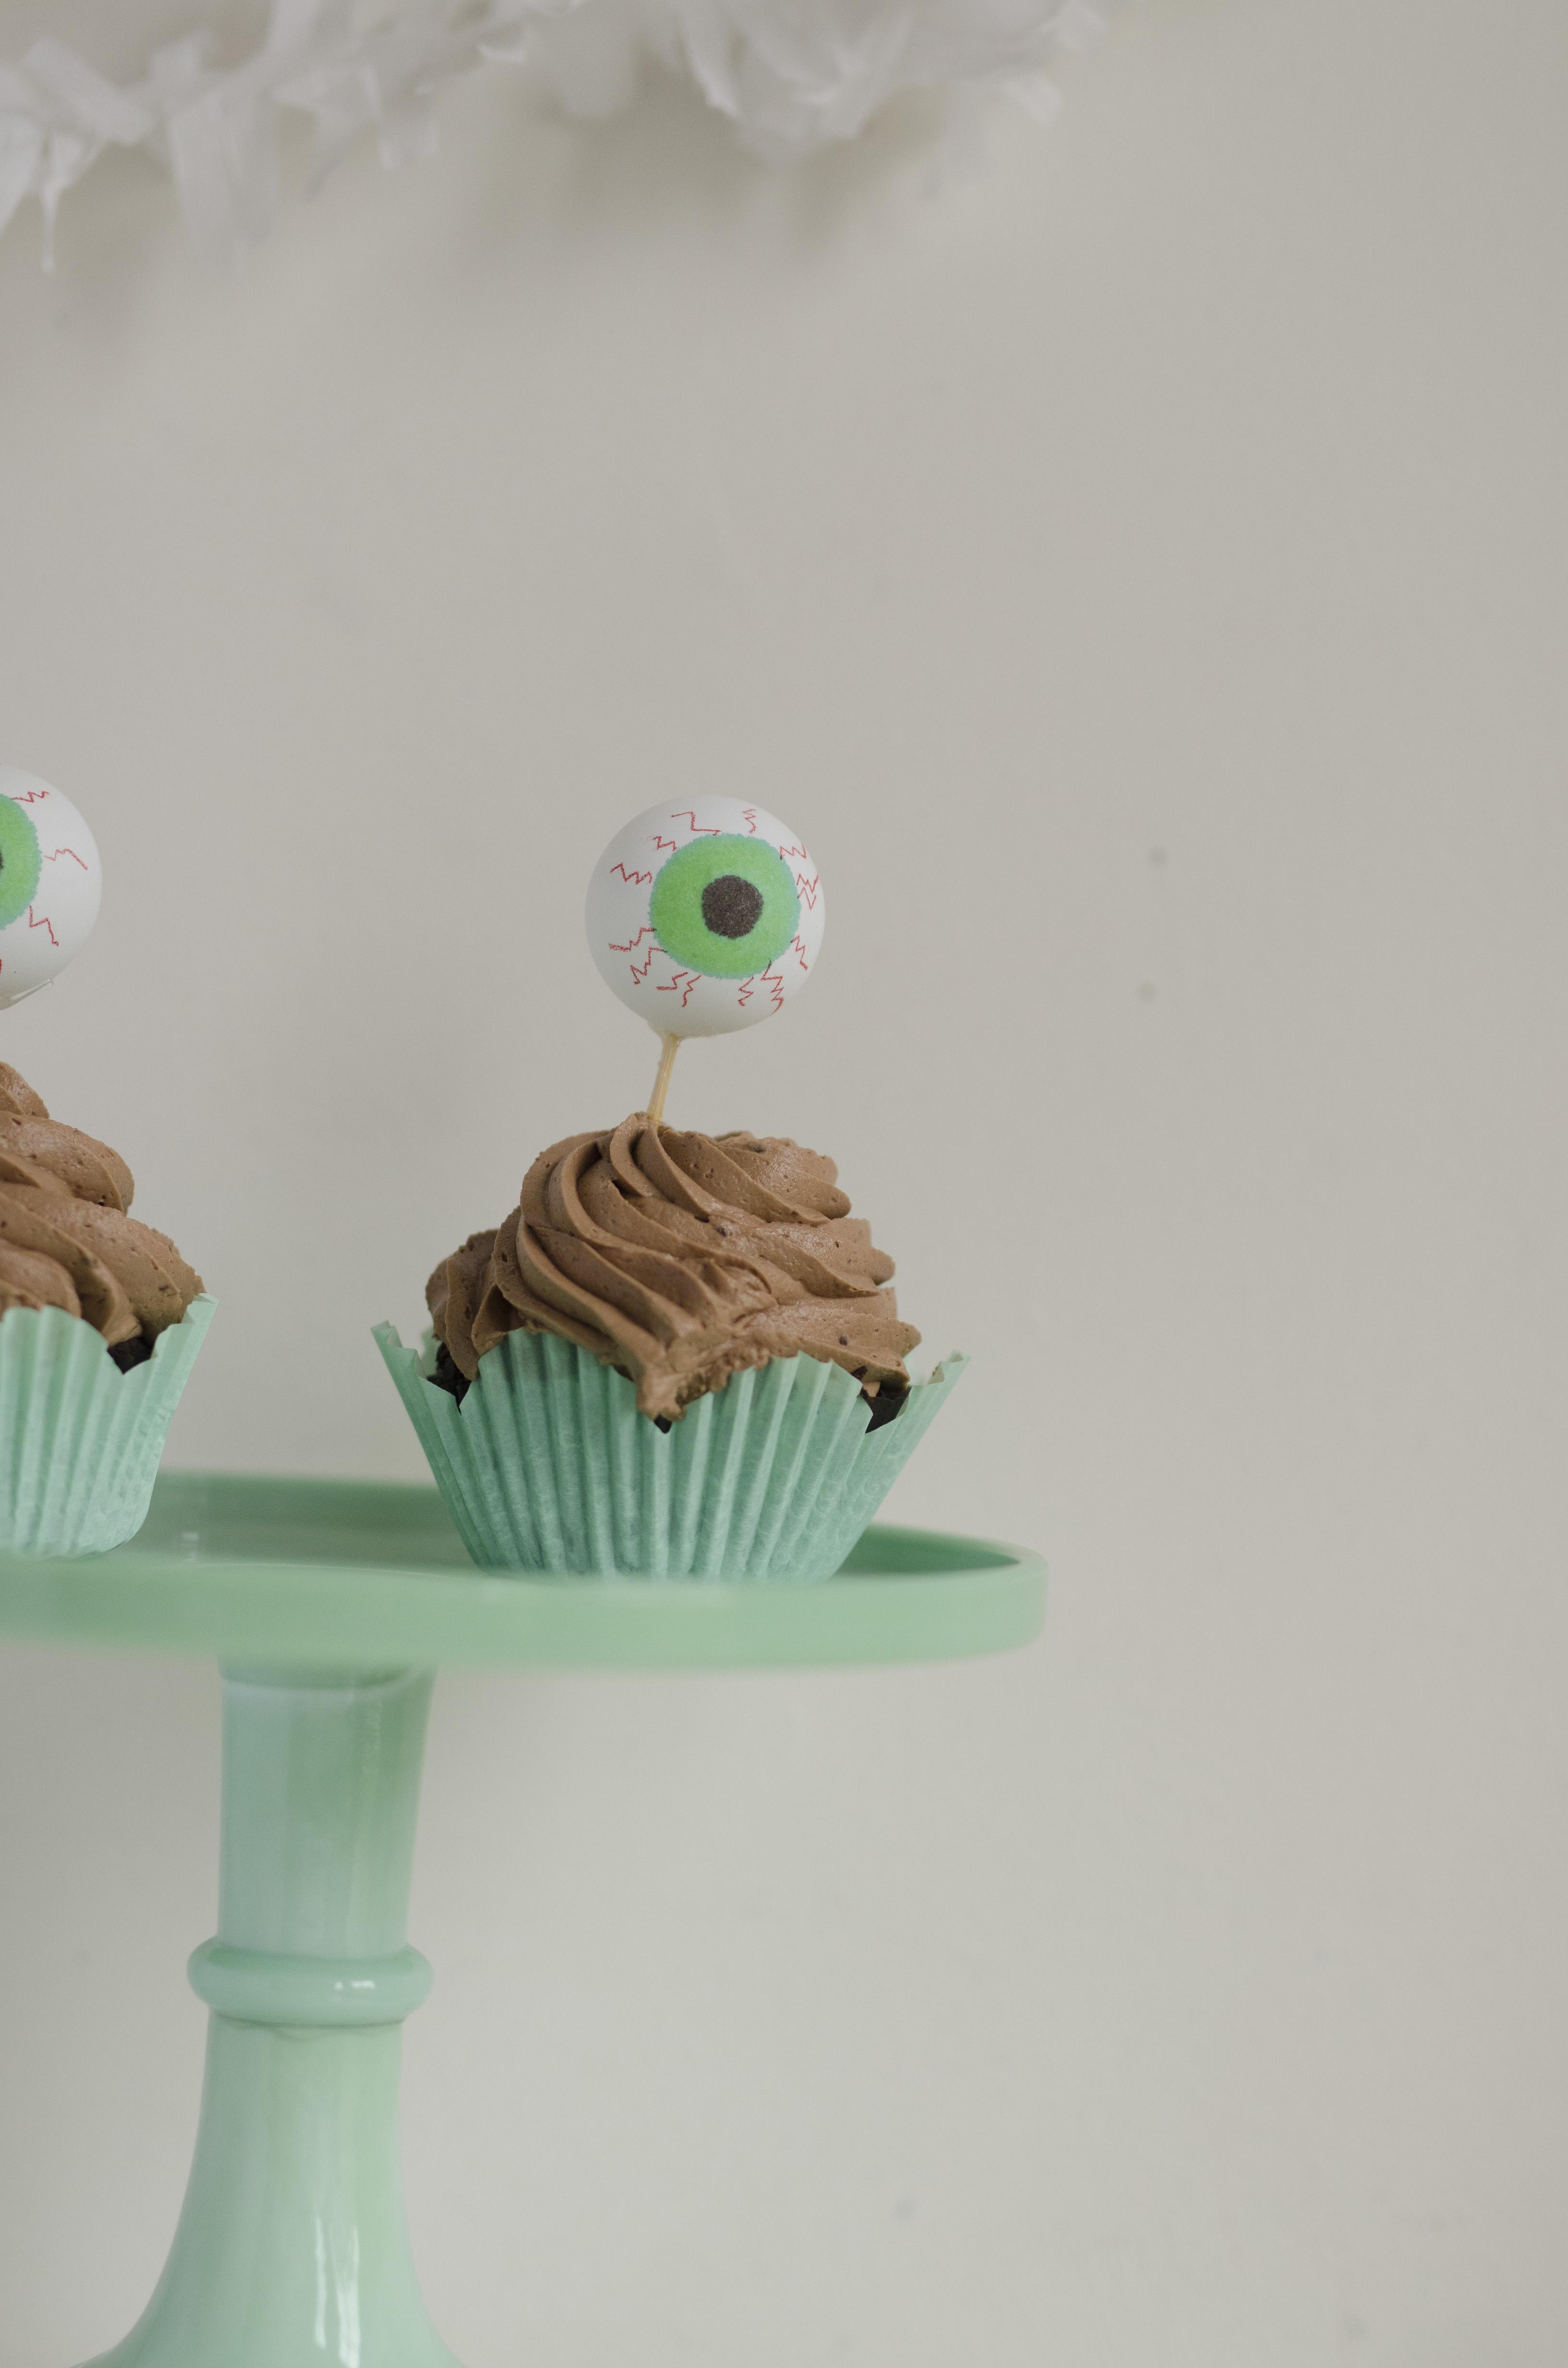 Eye Ball Cupcake FILMa_11